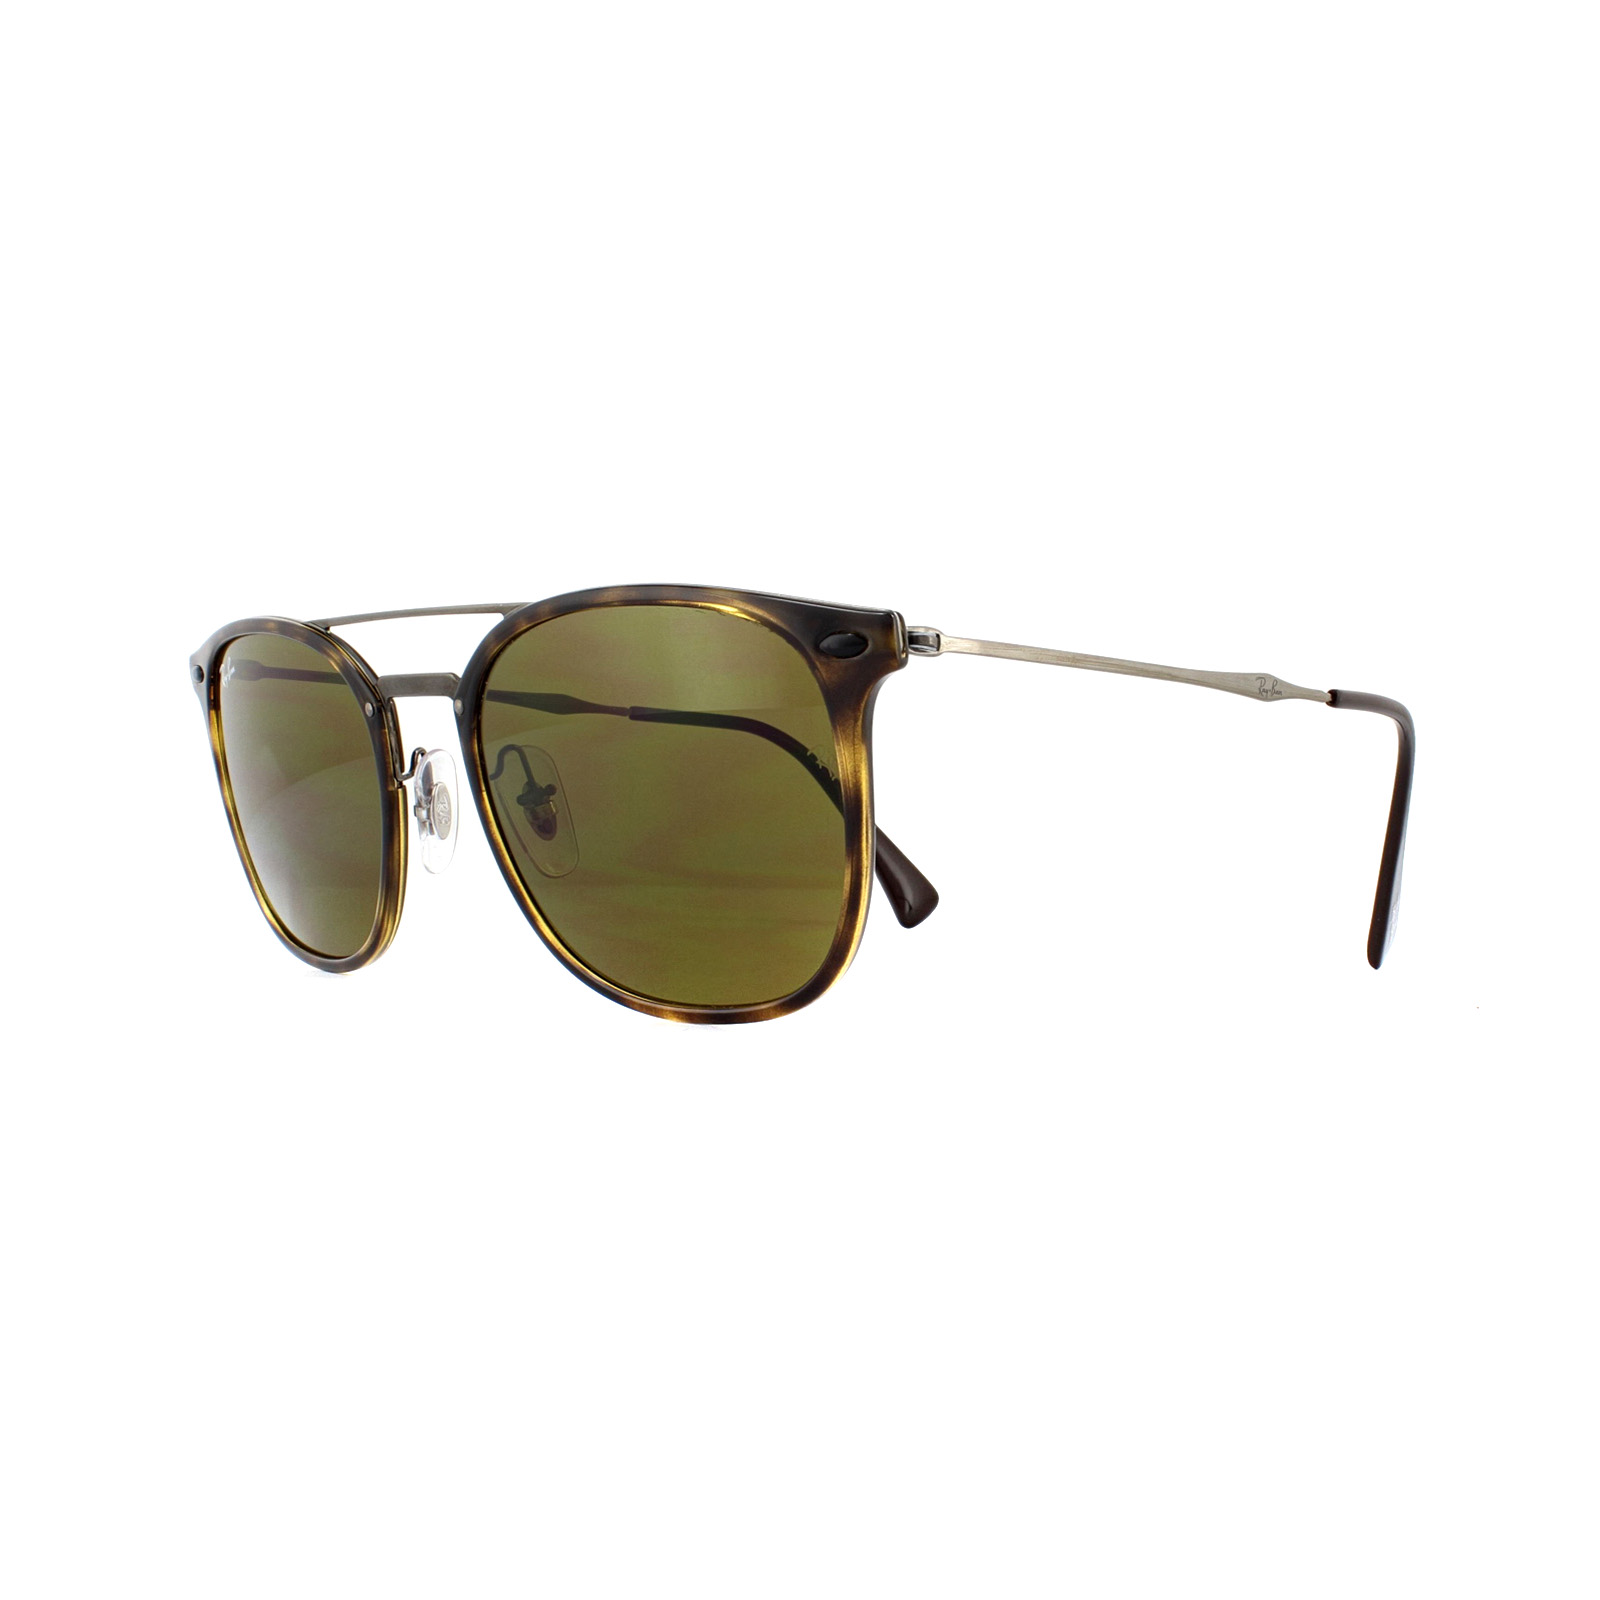 3c25647cab Ray-Ban Sunglasses RB4286 710 73 Havana Dark Brown 8053672770551